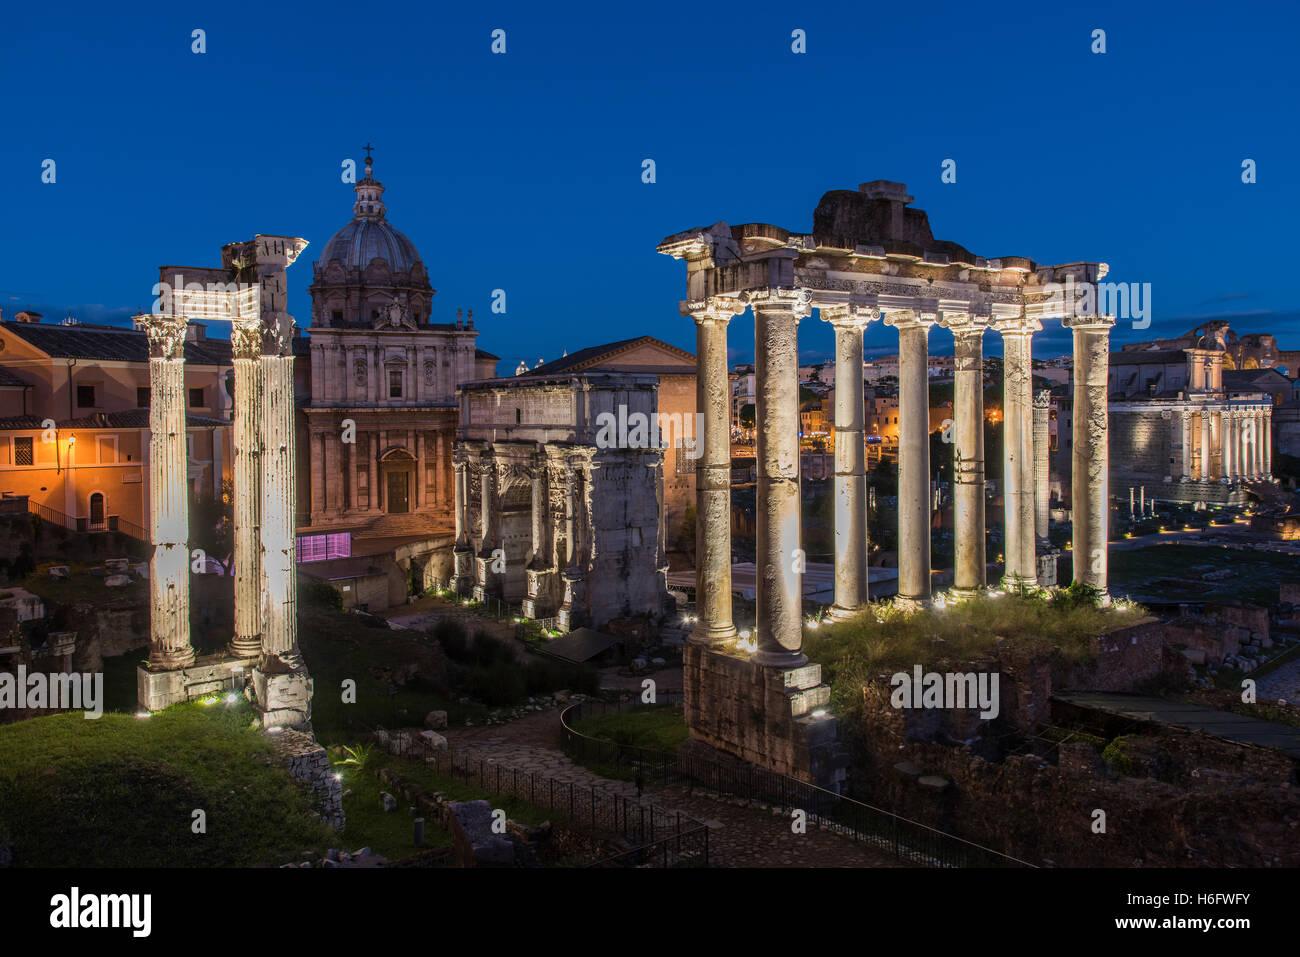 Night view of the Roman Forum, Rome, Lazio, Italy Stock Photo